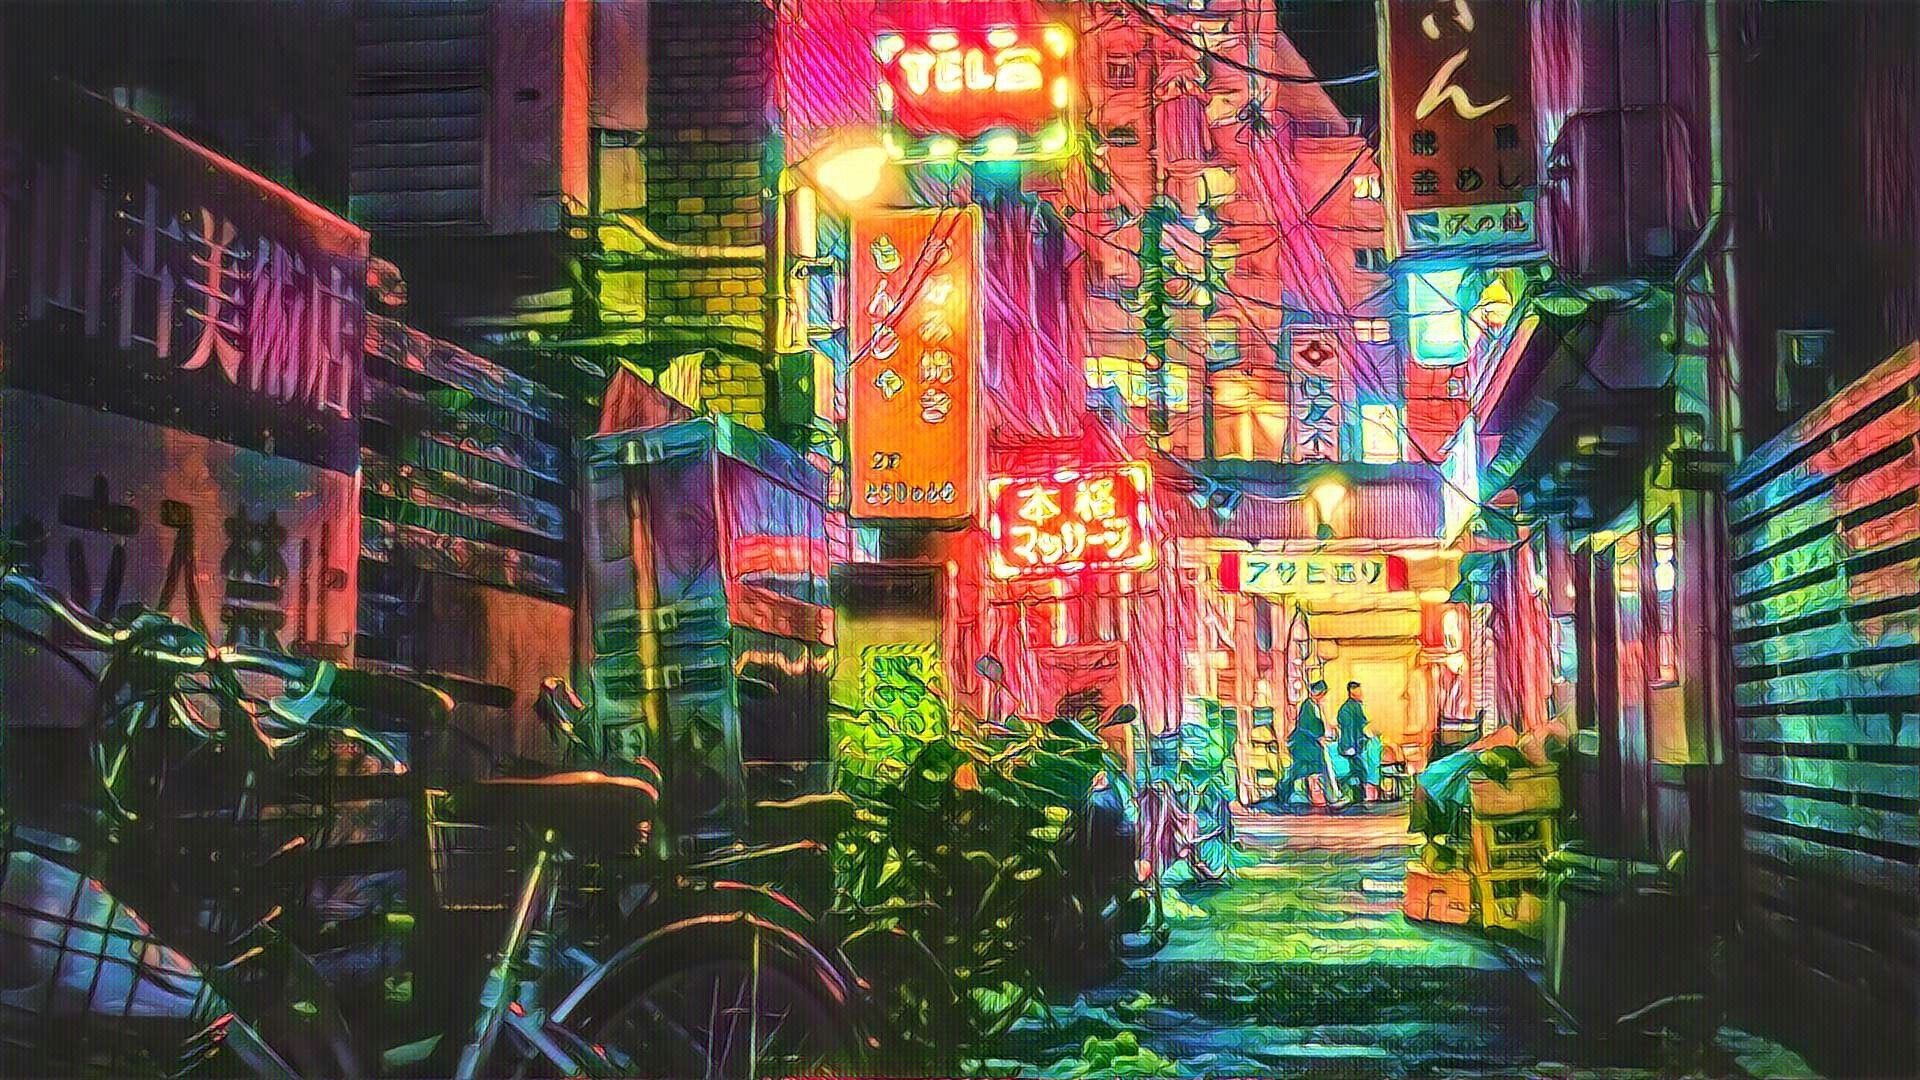 Neon Tokyo City Wallpaper 4k   Quotes and Wallpaper O